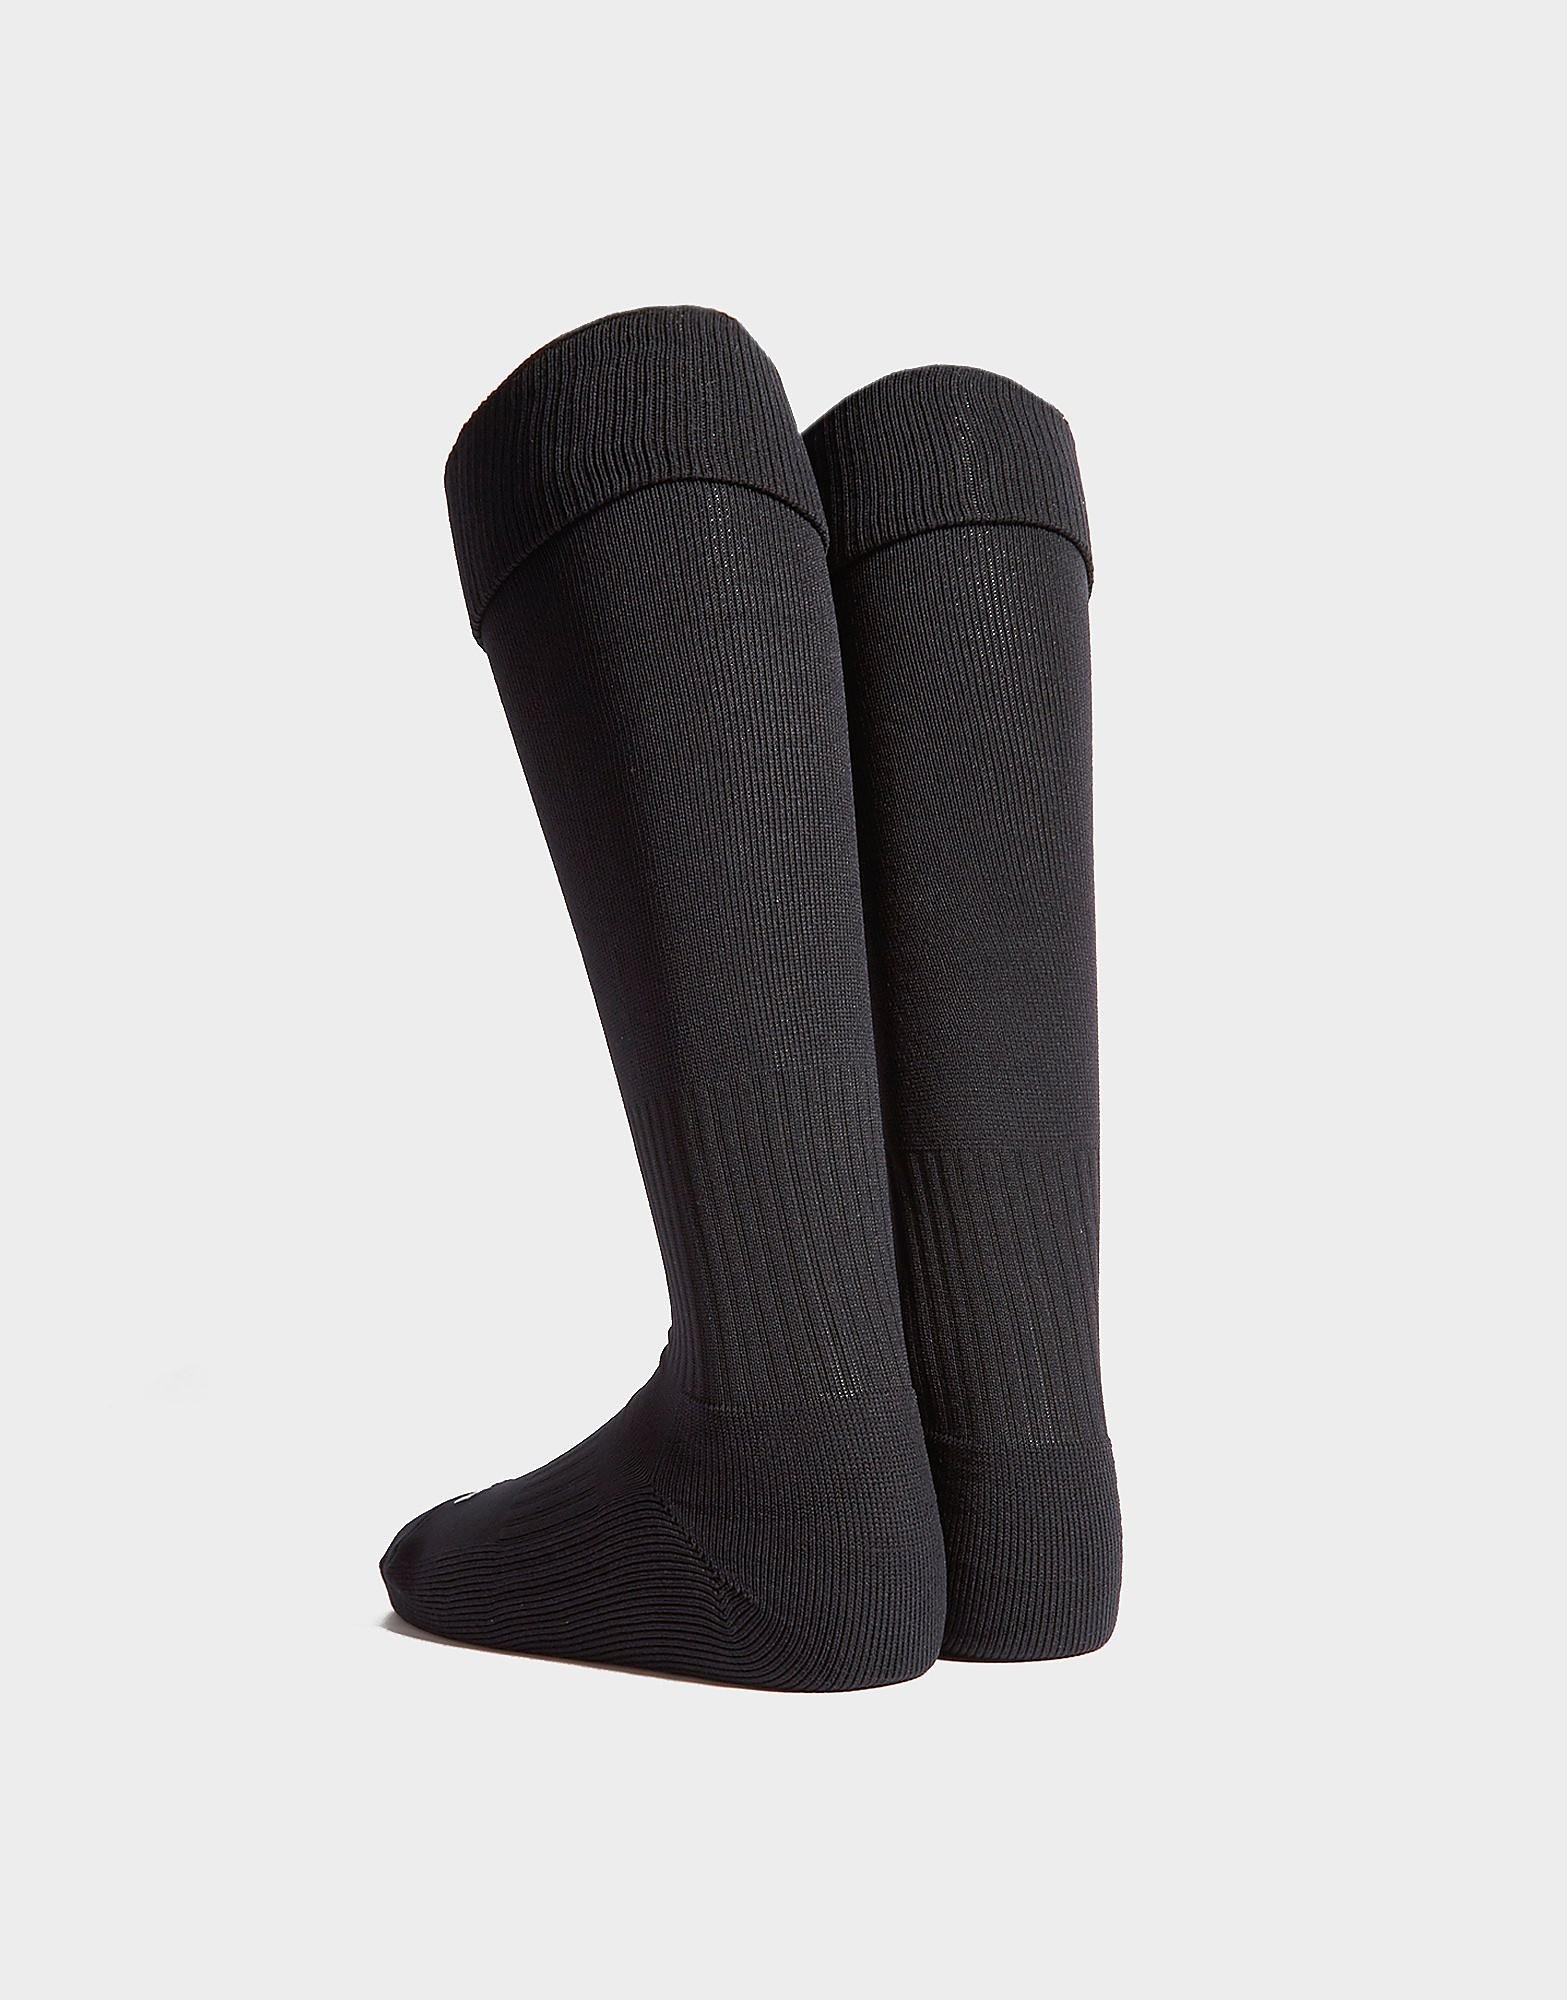 Nike Classic Football Socks